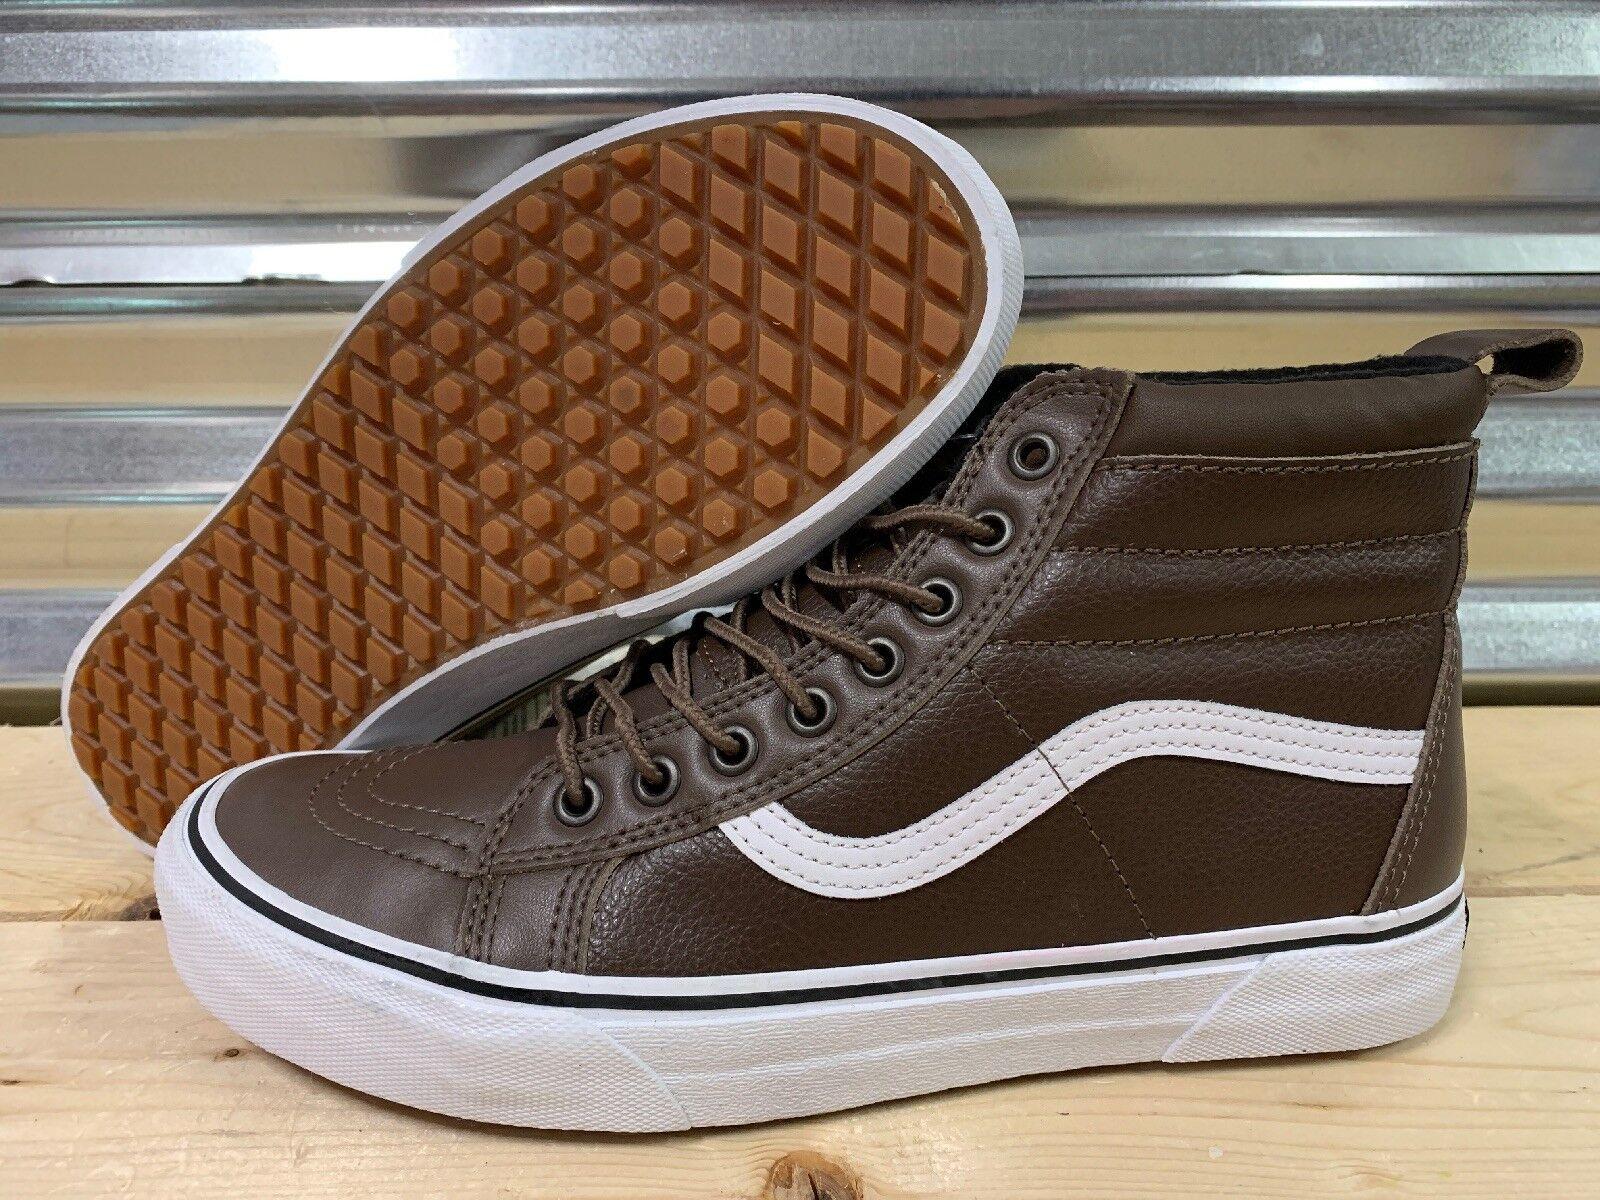 Forro Cálido Vans Sk8 Hi MTE sb zapatos lluvia Drum Marrón Cuero (VN0A33TXUQC)